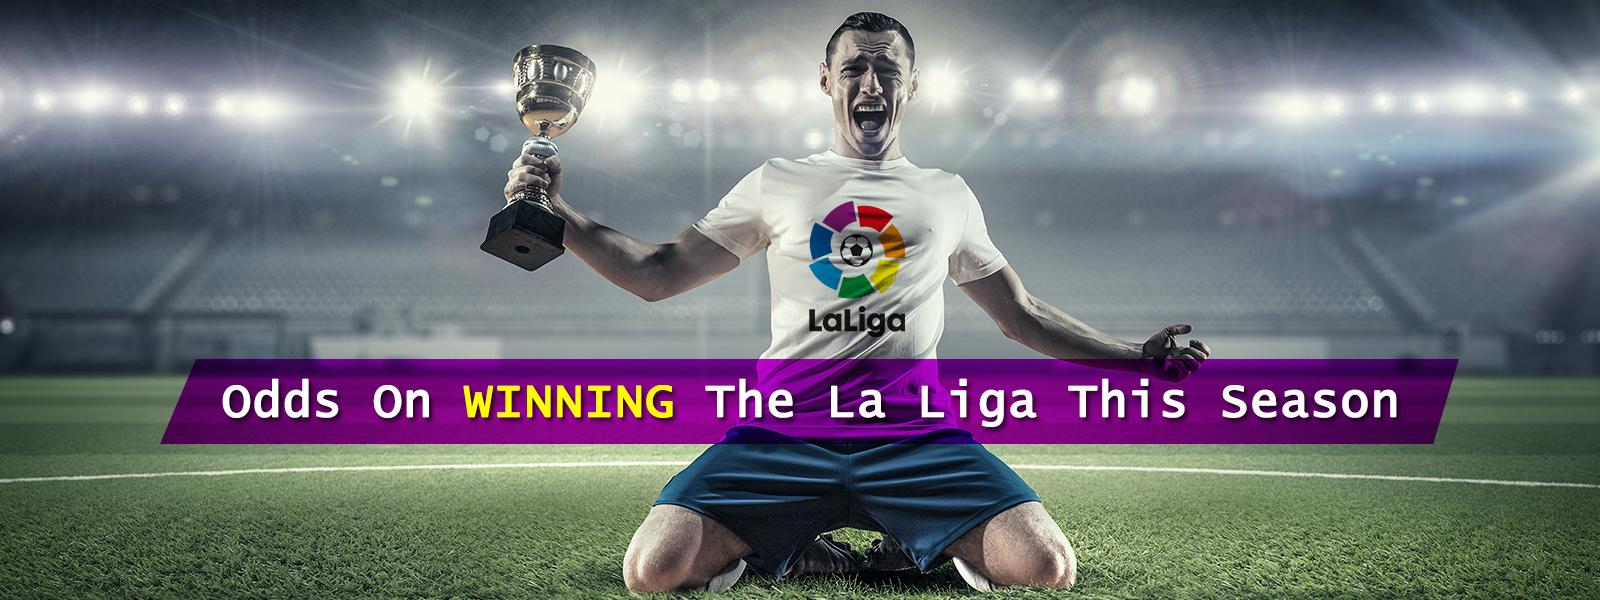 Top 4 Winner Predictions With Odds In La Liga